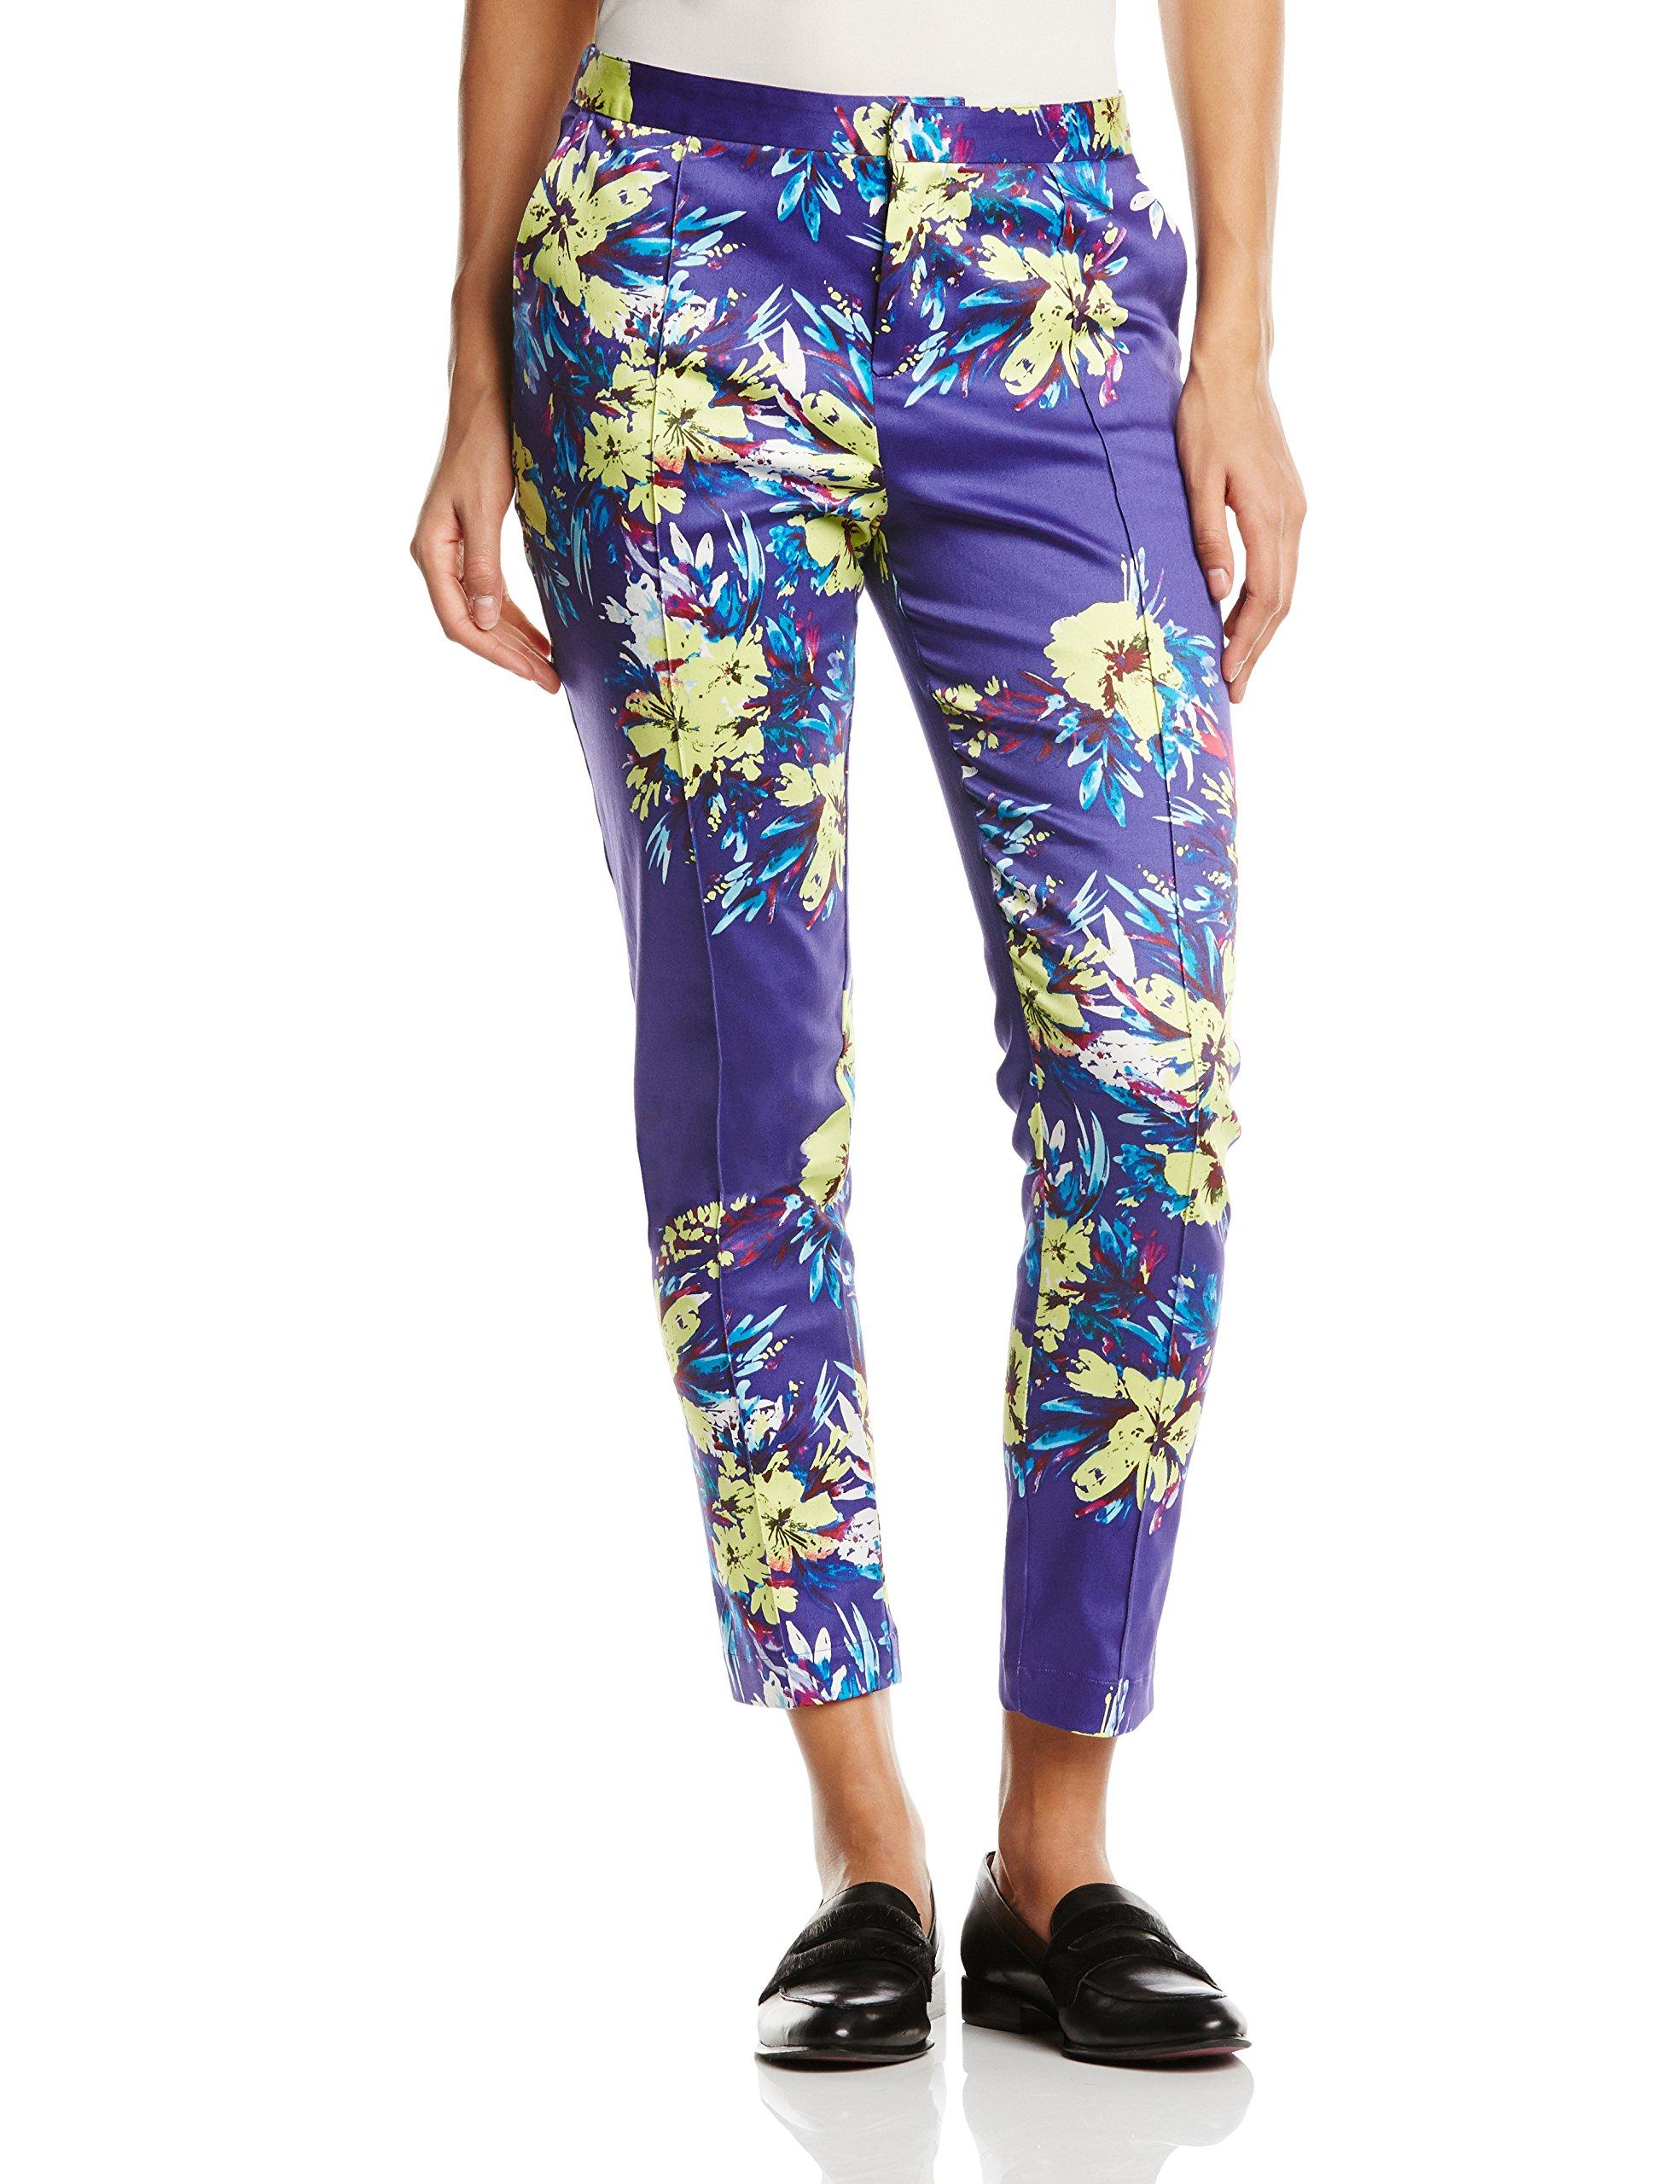 Raquel Darling PantalonBleufrench FabricantMediumFemme Trousers NavyFr38taille ED92eIHWY